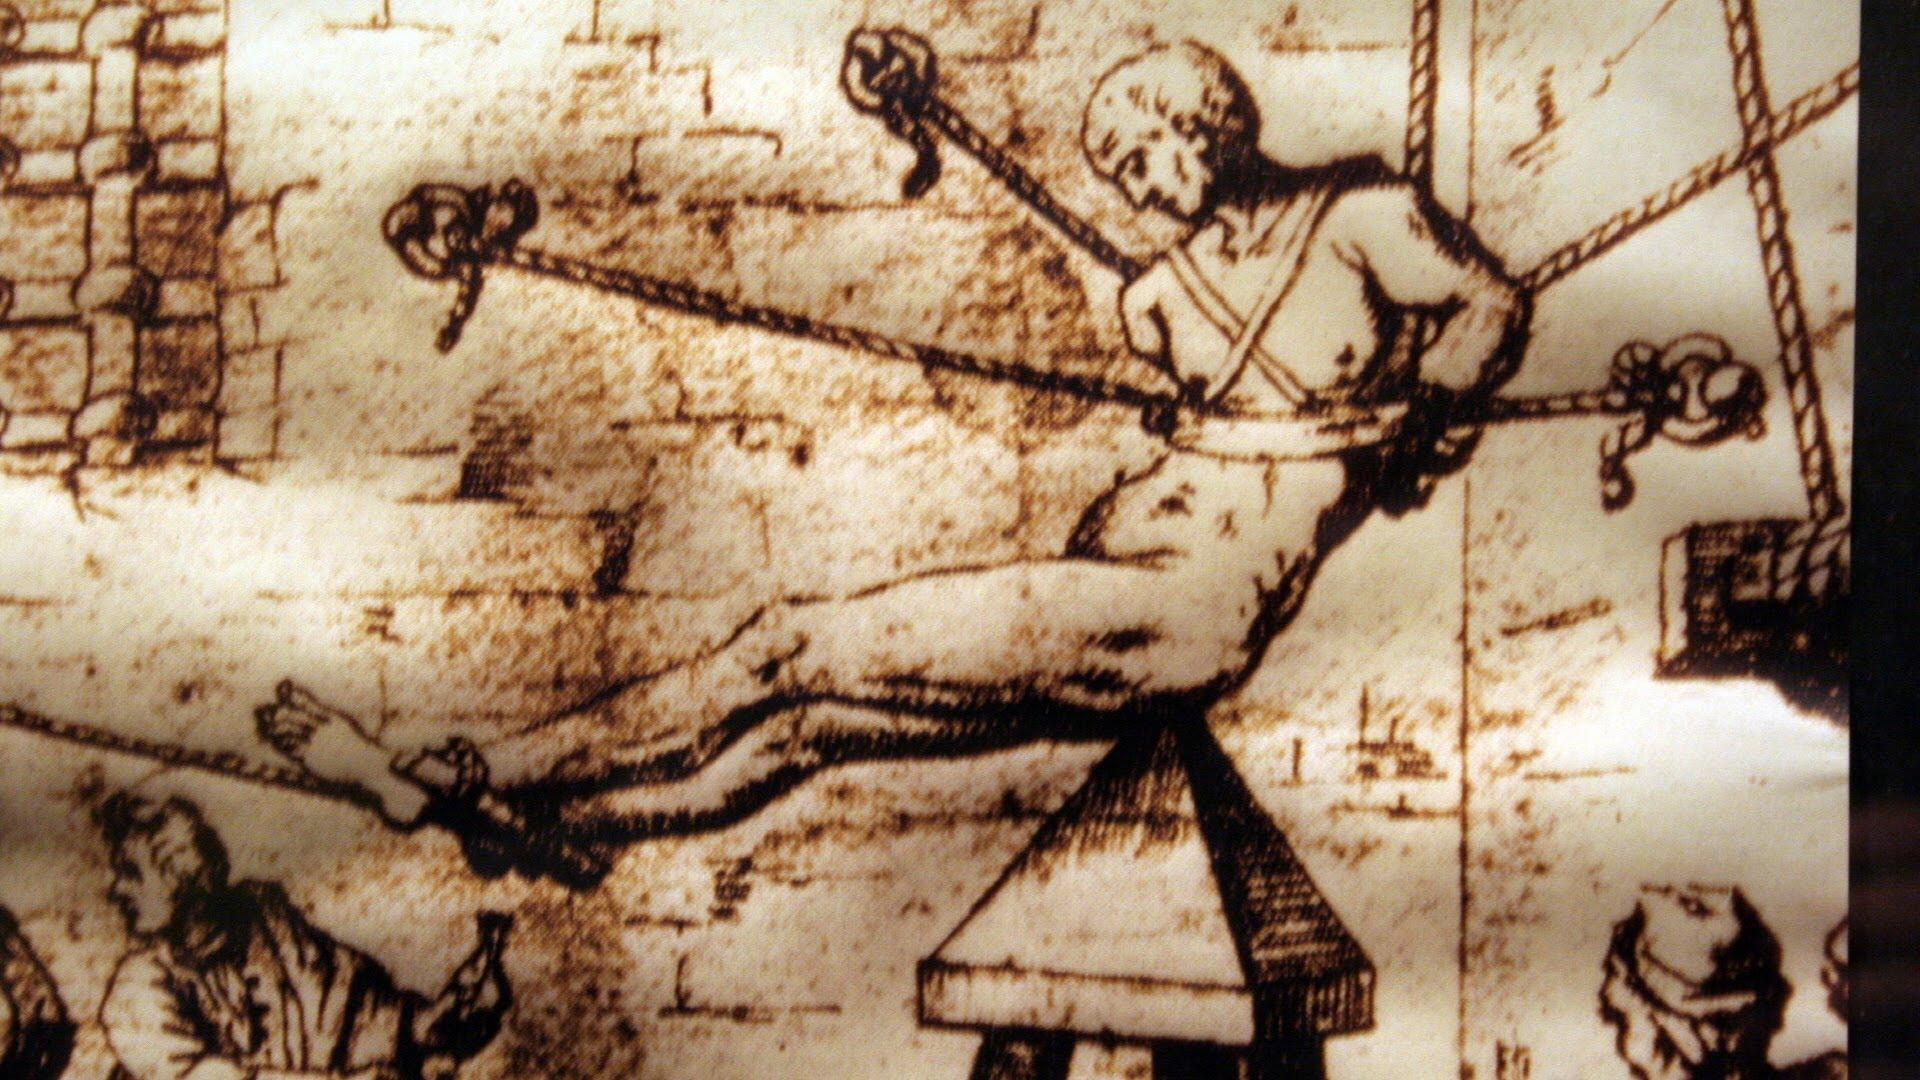 Judas Cradle – medieval torture device